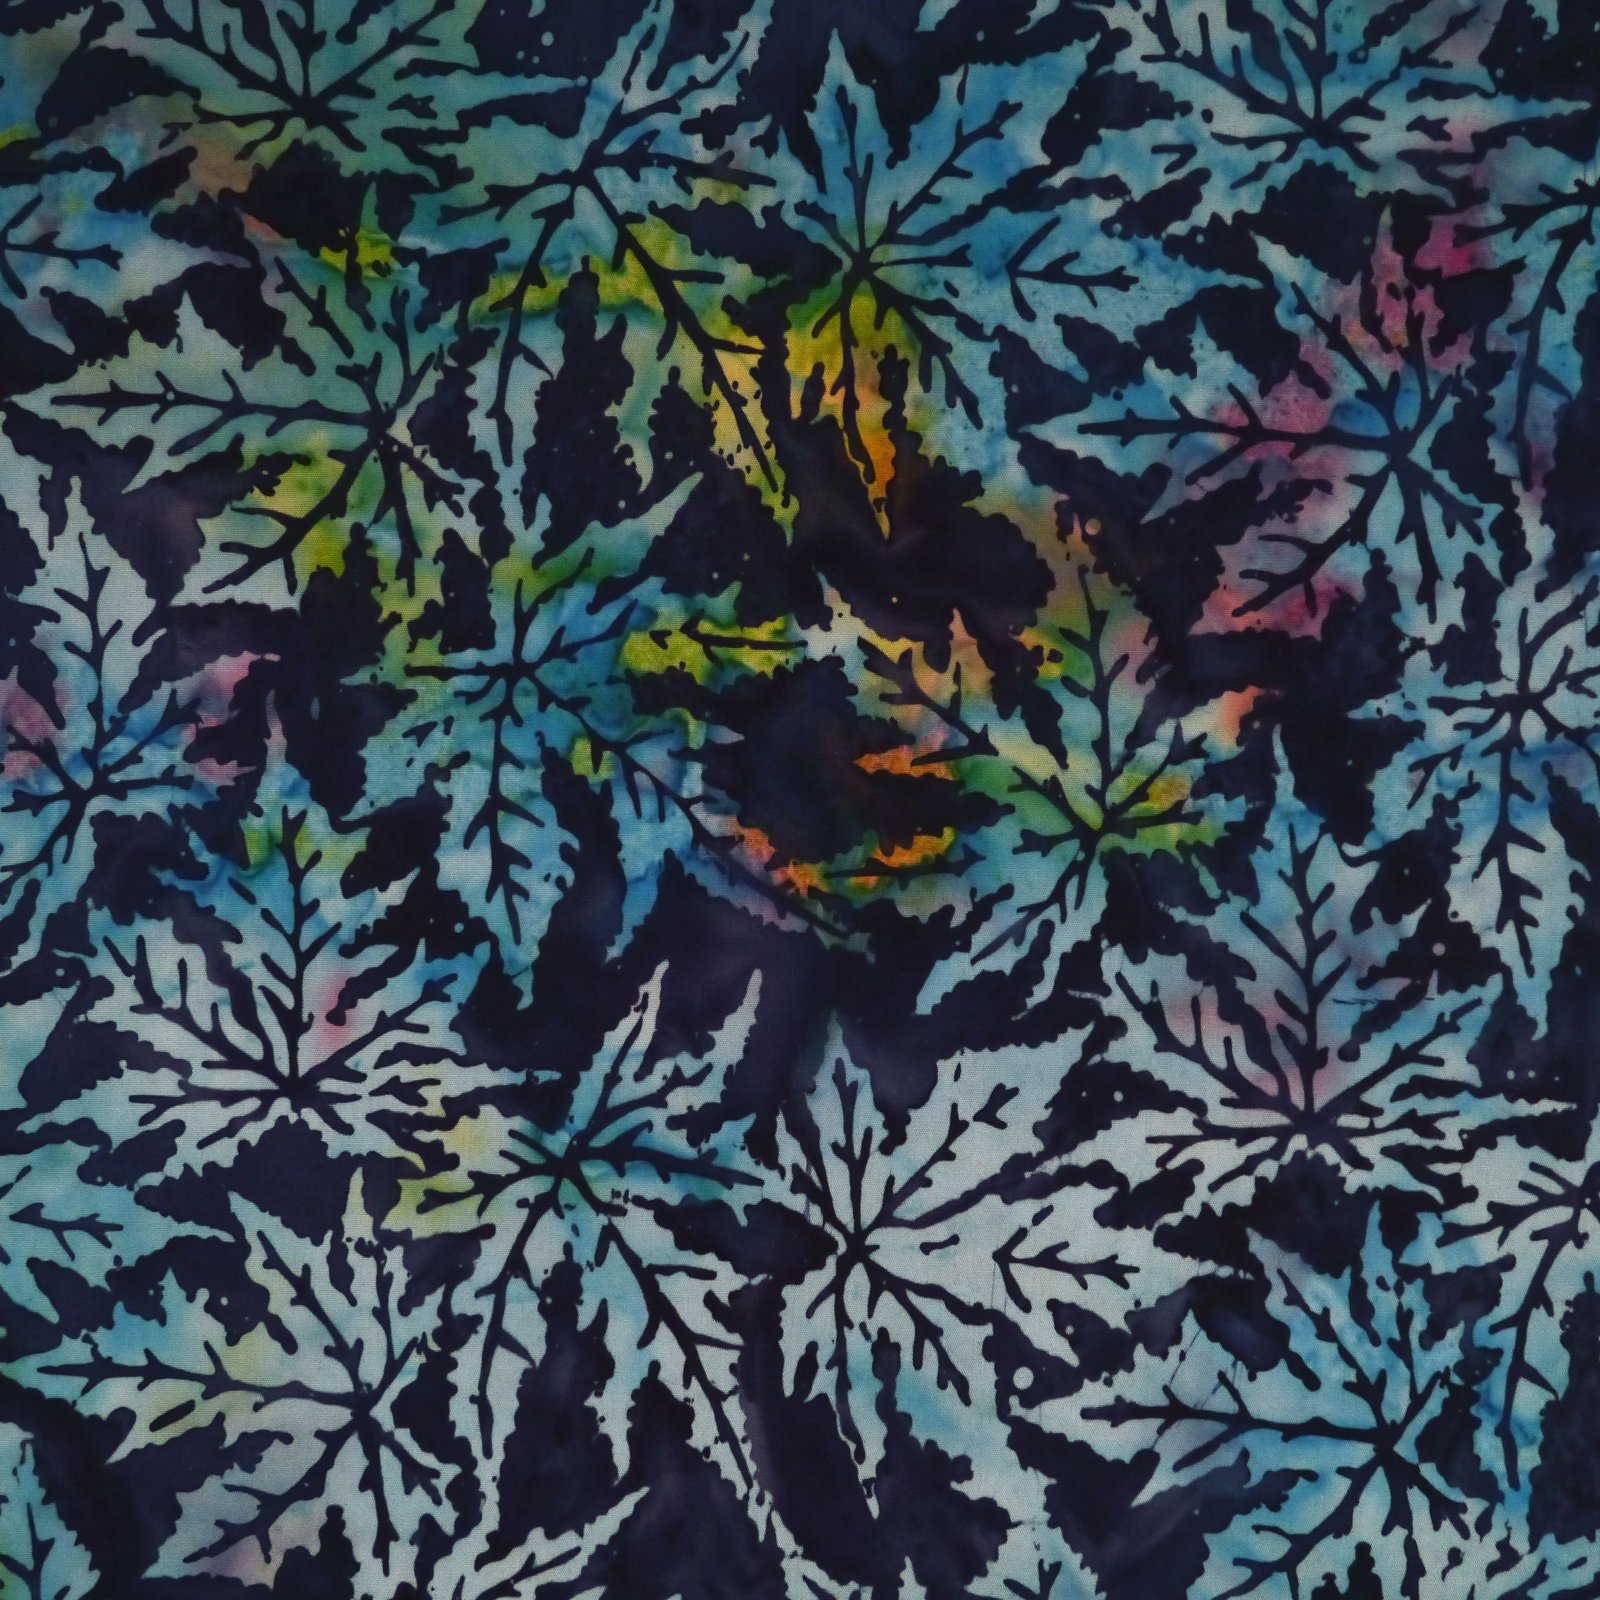 Blues - Botanica Magica -  Batik by Mirah